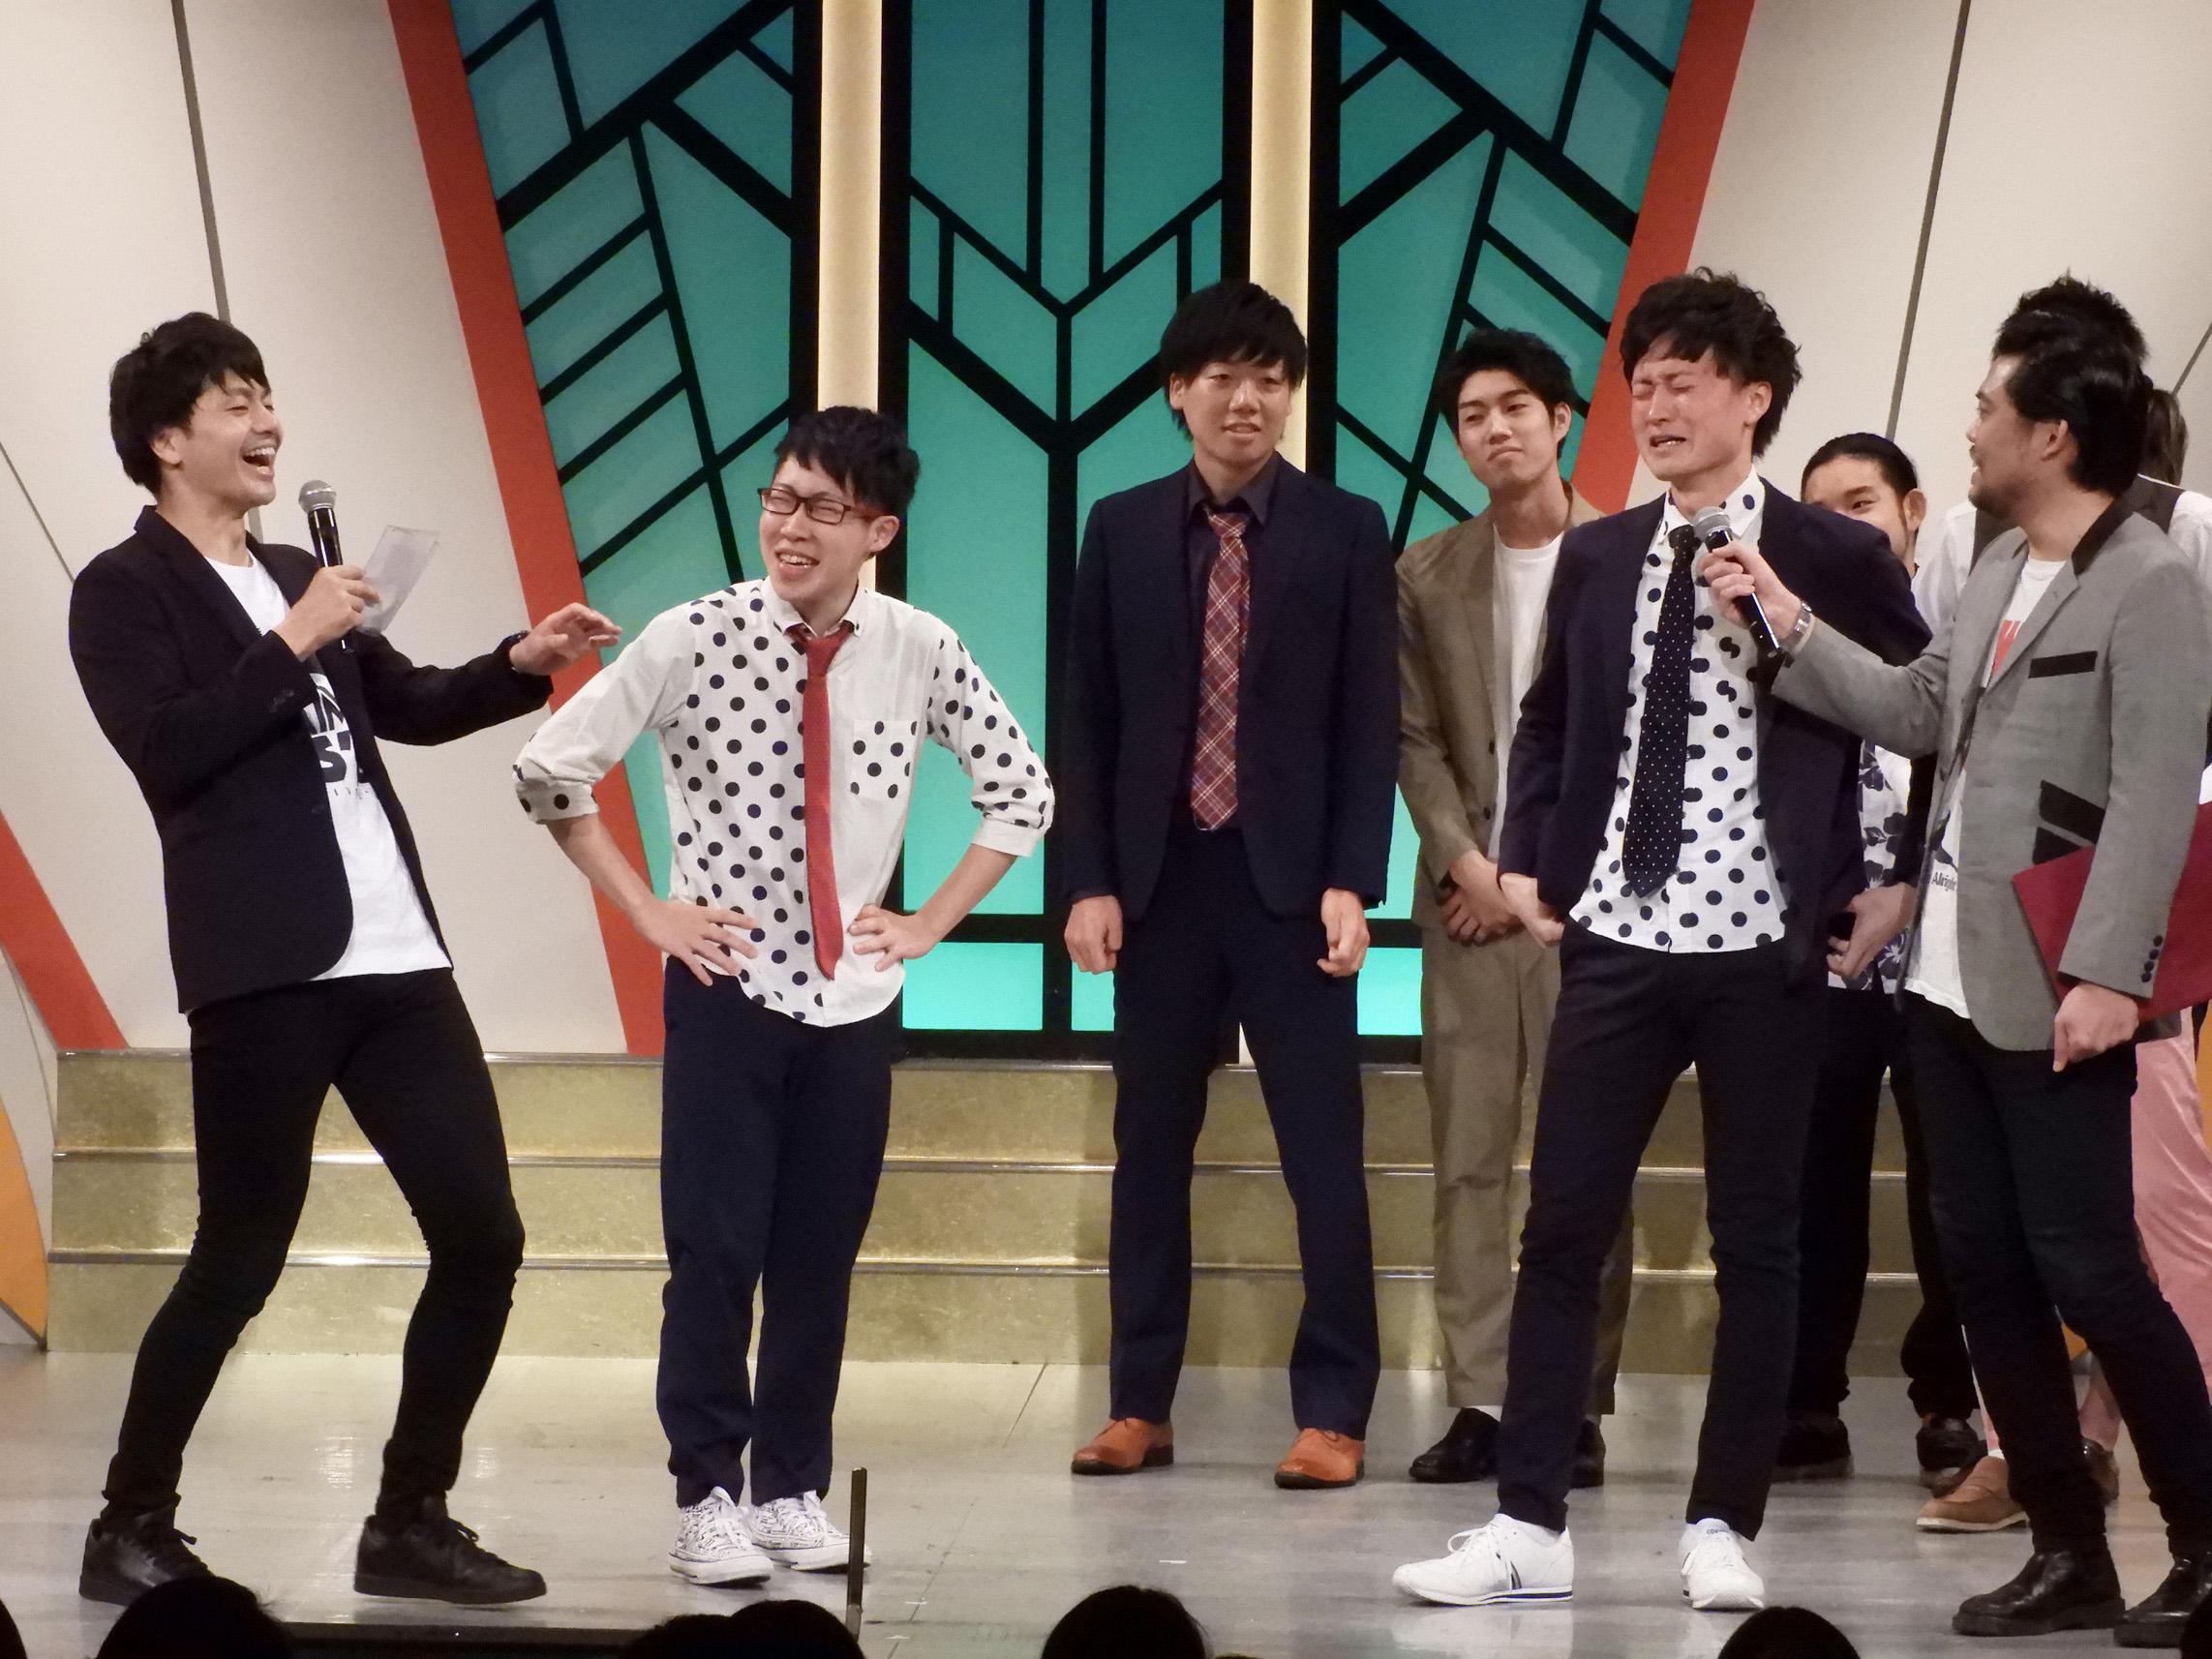 http://news.yoshimoto.co.jp/20181109121623-a464f08e8f16a60f3e5fdf9b4dbabc397c8bf8a1.jpg